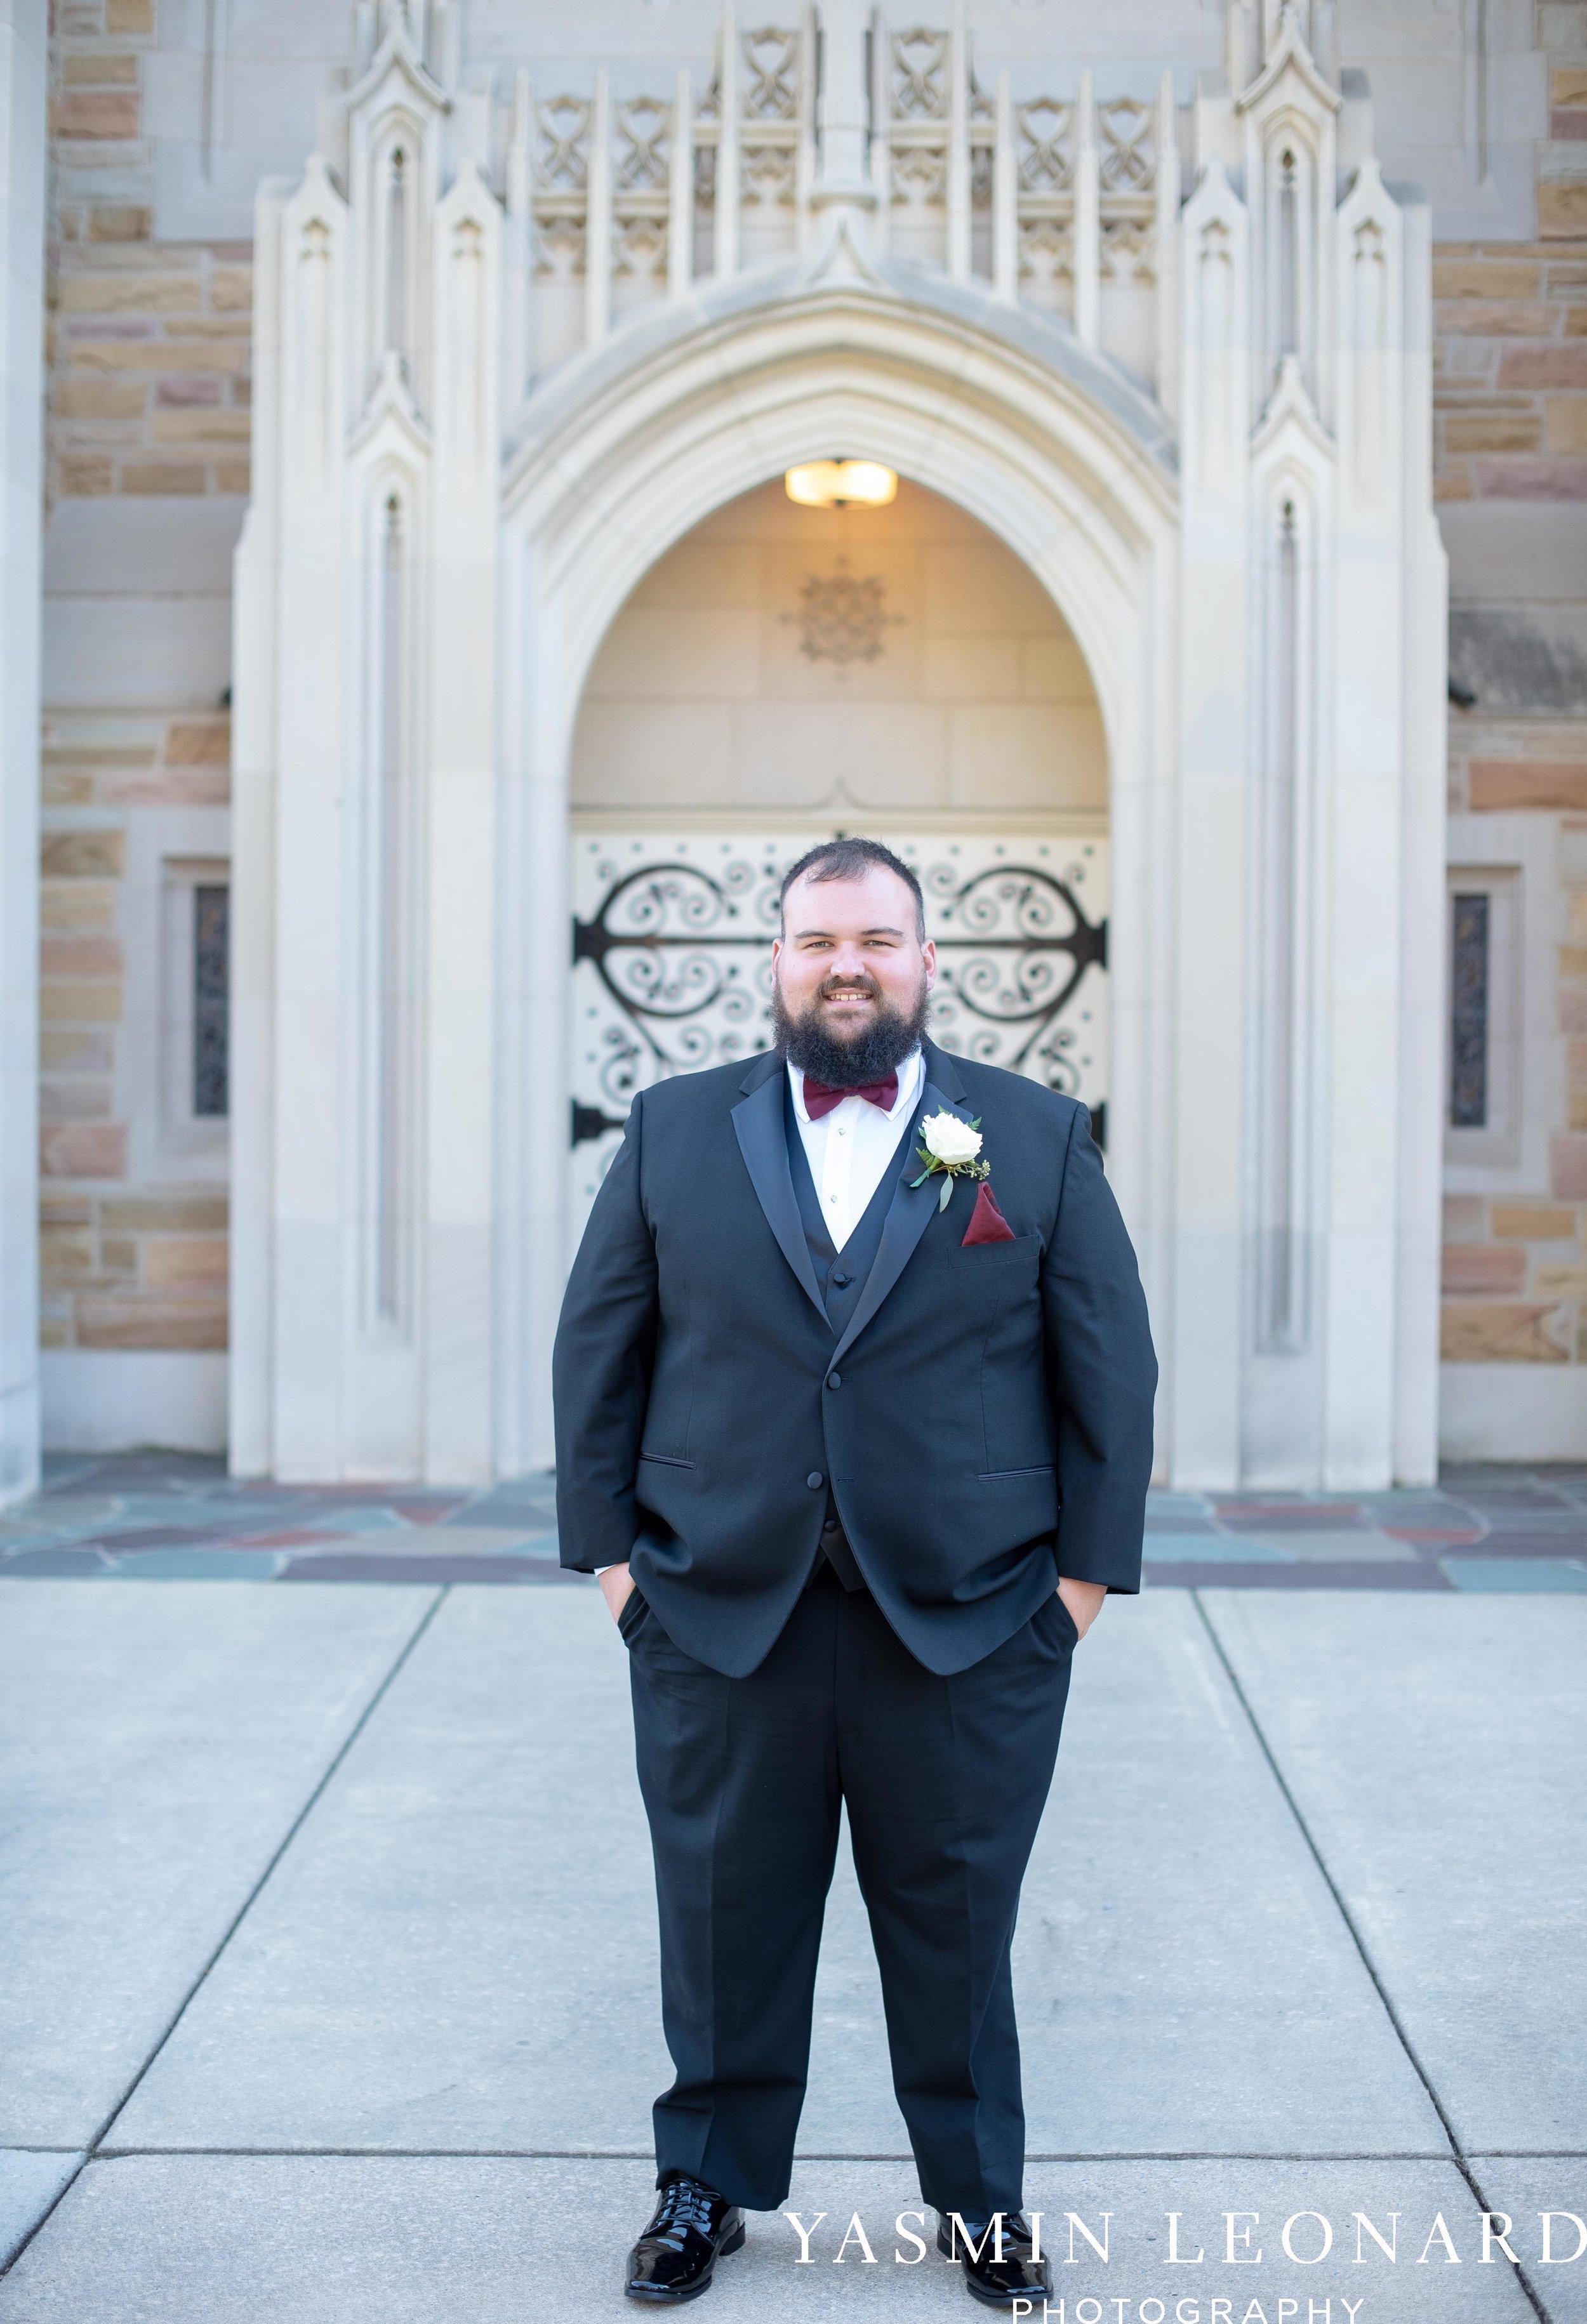 Wesley Memorial United Methodist Church - Old Homeplace Winery - High Point Weddings - High Point Wedding Photographer - NC Weddings - NC Barn Venue - Yasmin Leonard Photography-3.jpg